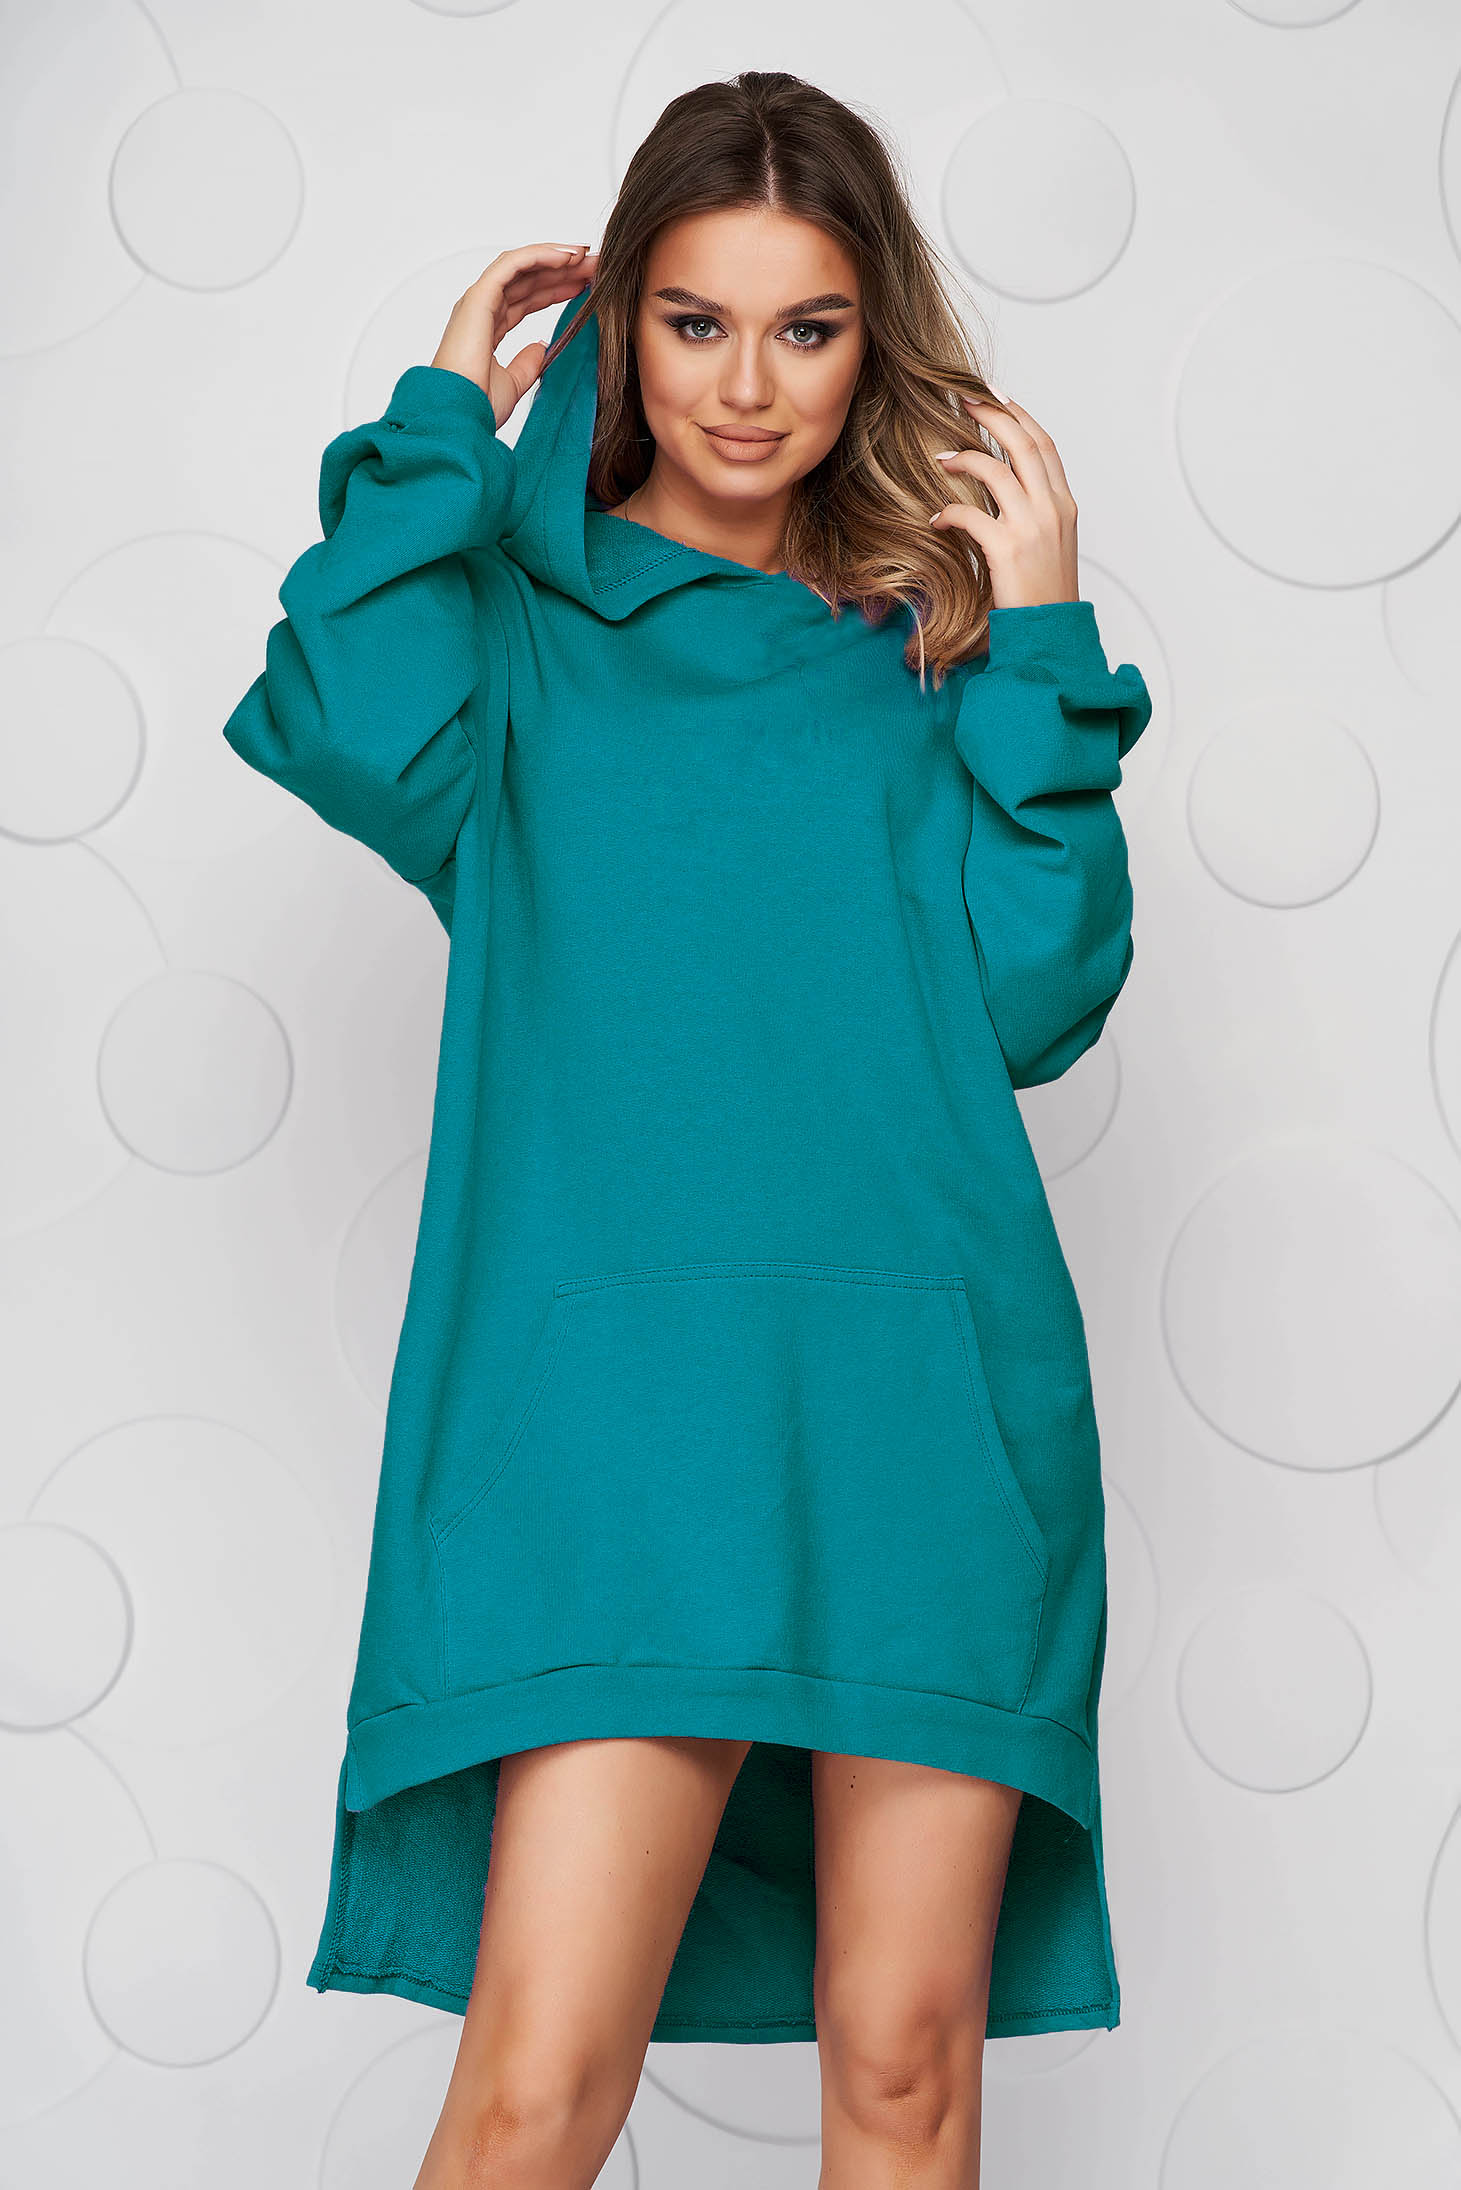 Green dress slightly elastic cotton asymmetrical loose fit